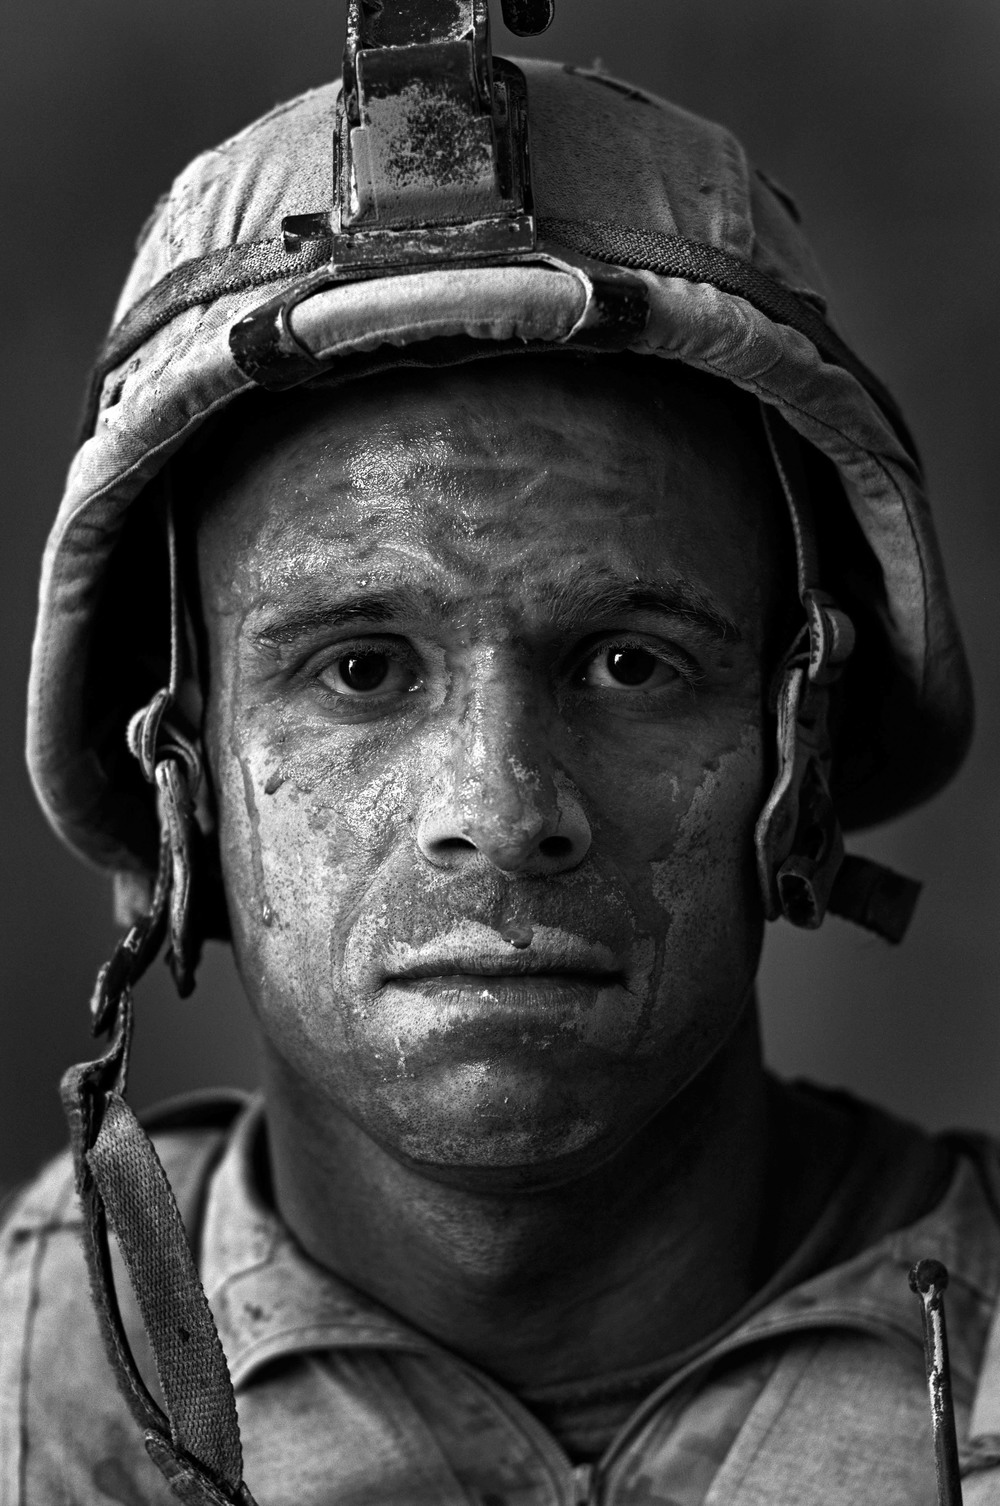 U.S. Marine GySgt. Carlos ''OJ'' Orjuela©Louie Palu/ZUMAPRESS.com